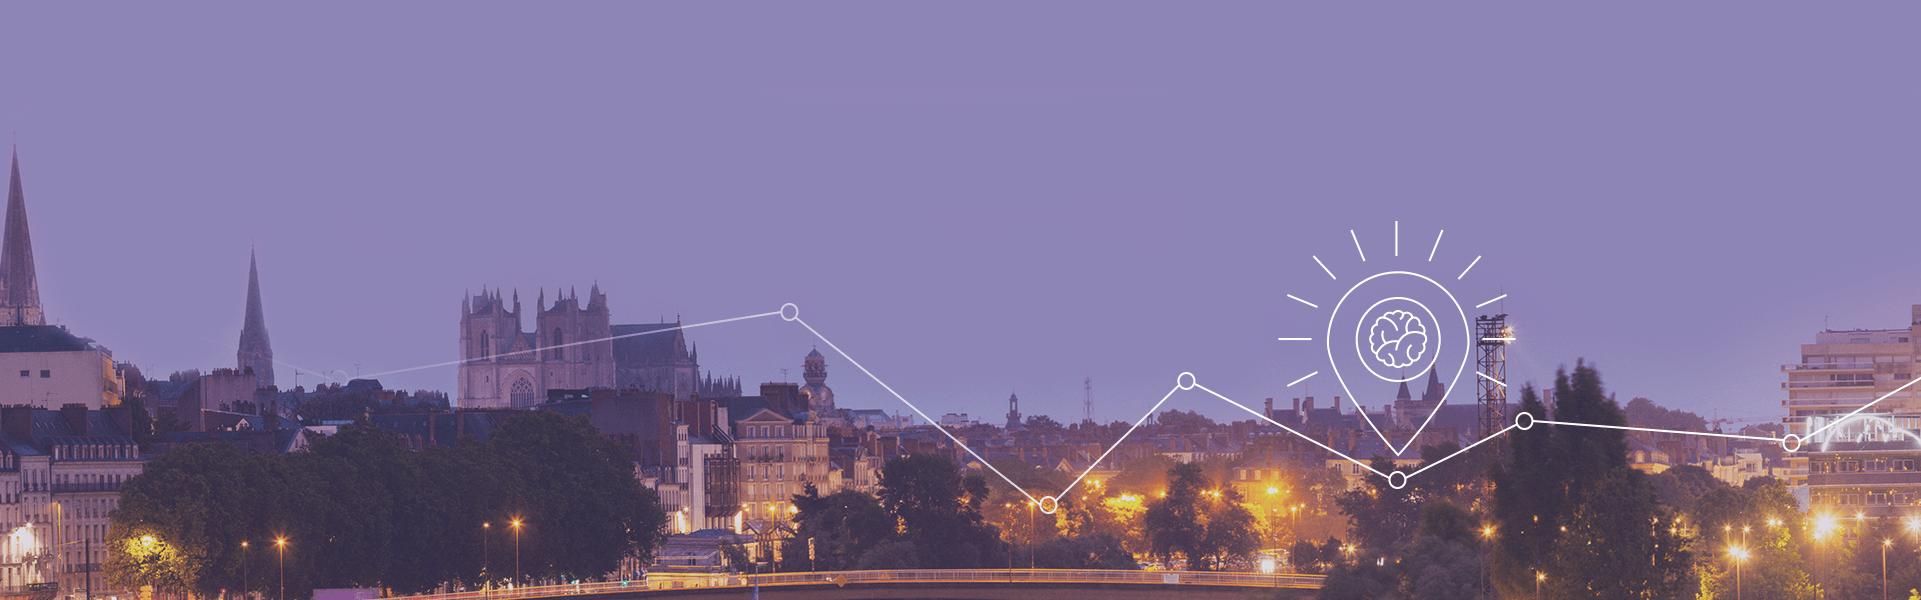 Nantes progress